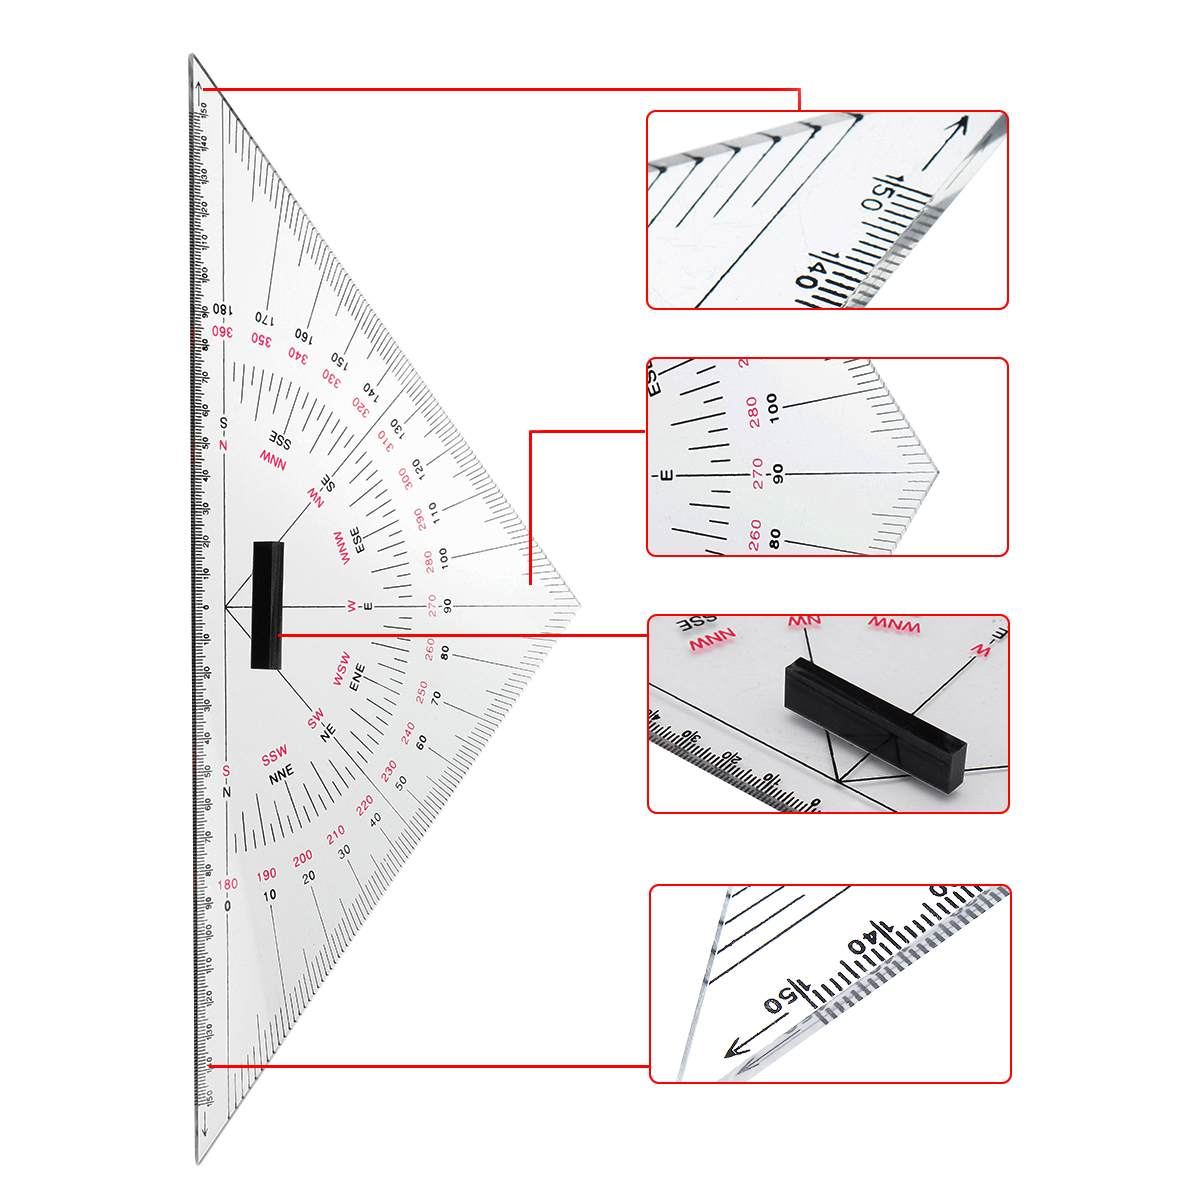 Nautical Chart Divider Measurement Tools 2X Navigation Triangular Protractor